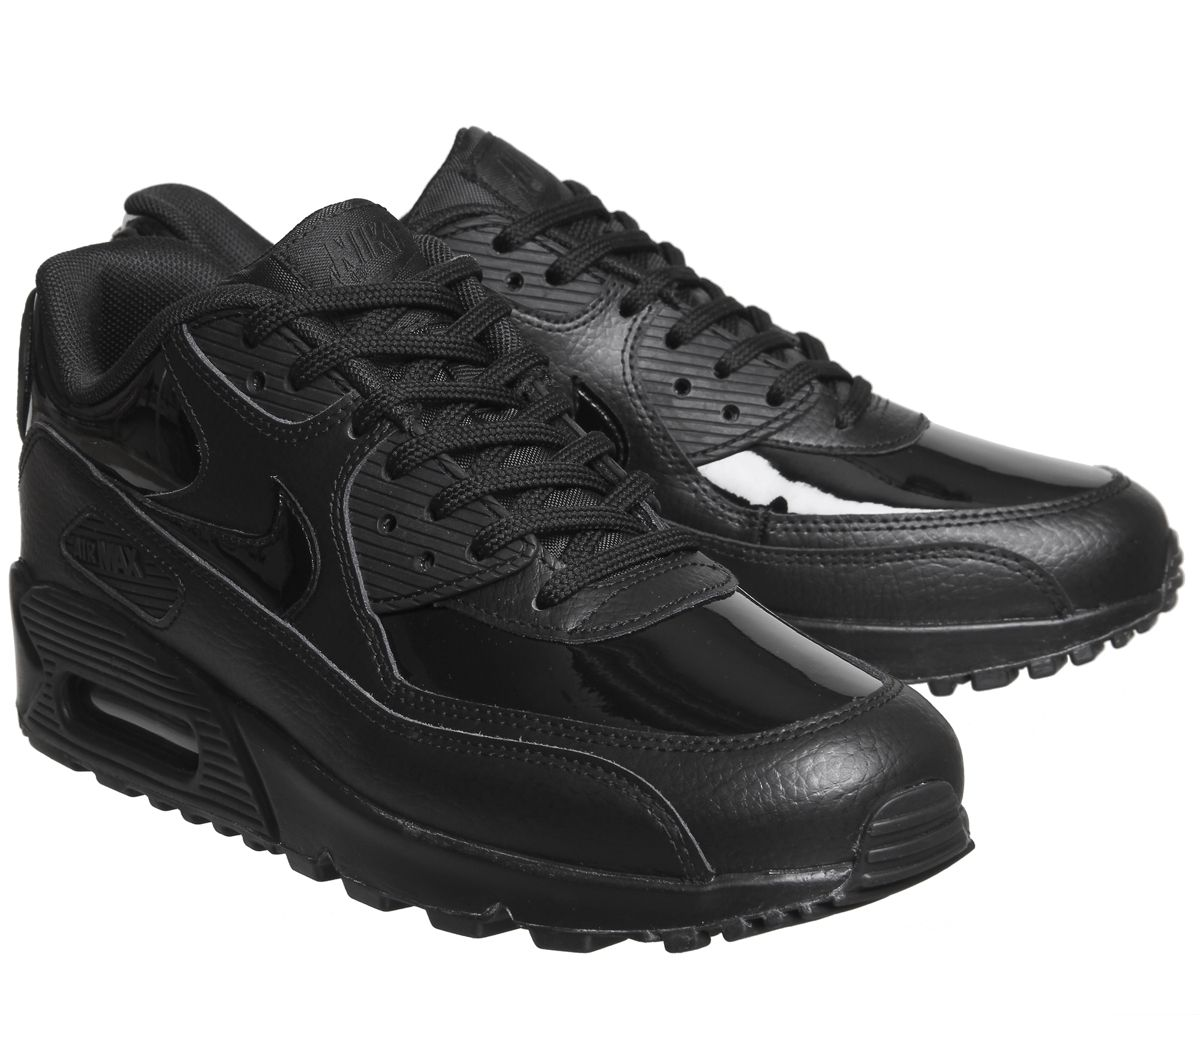 free shipping 3db8e 6e225 Nike Air Max 90 Trainers Black Patent - Unisex Sports